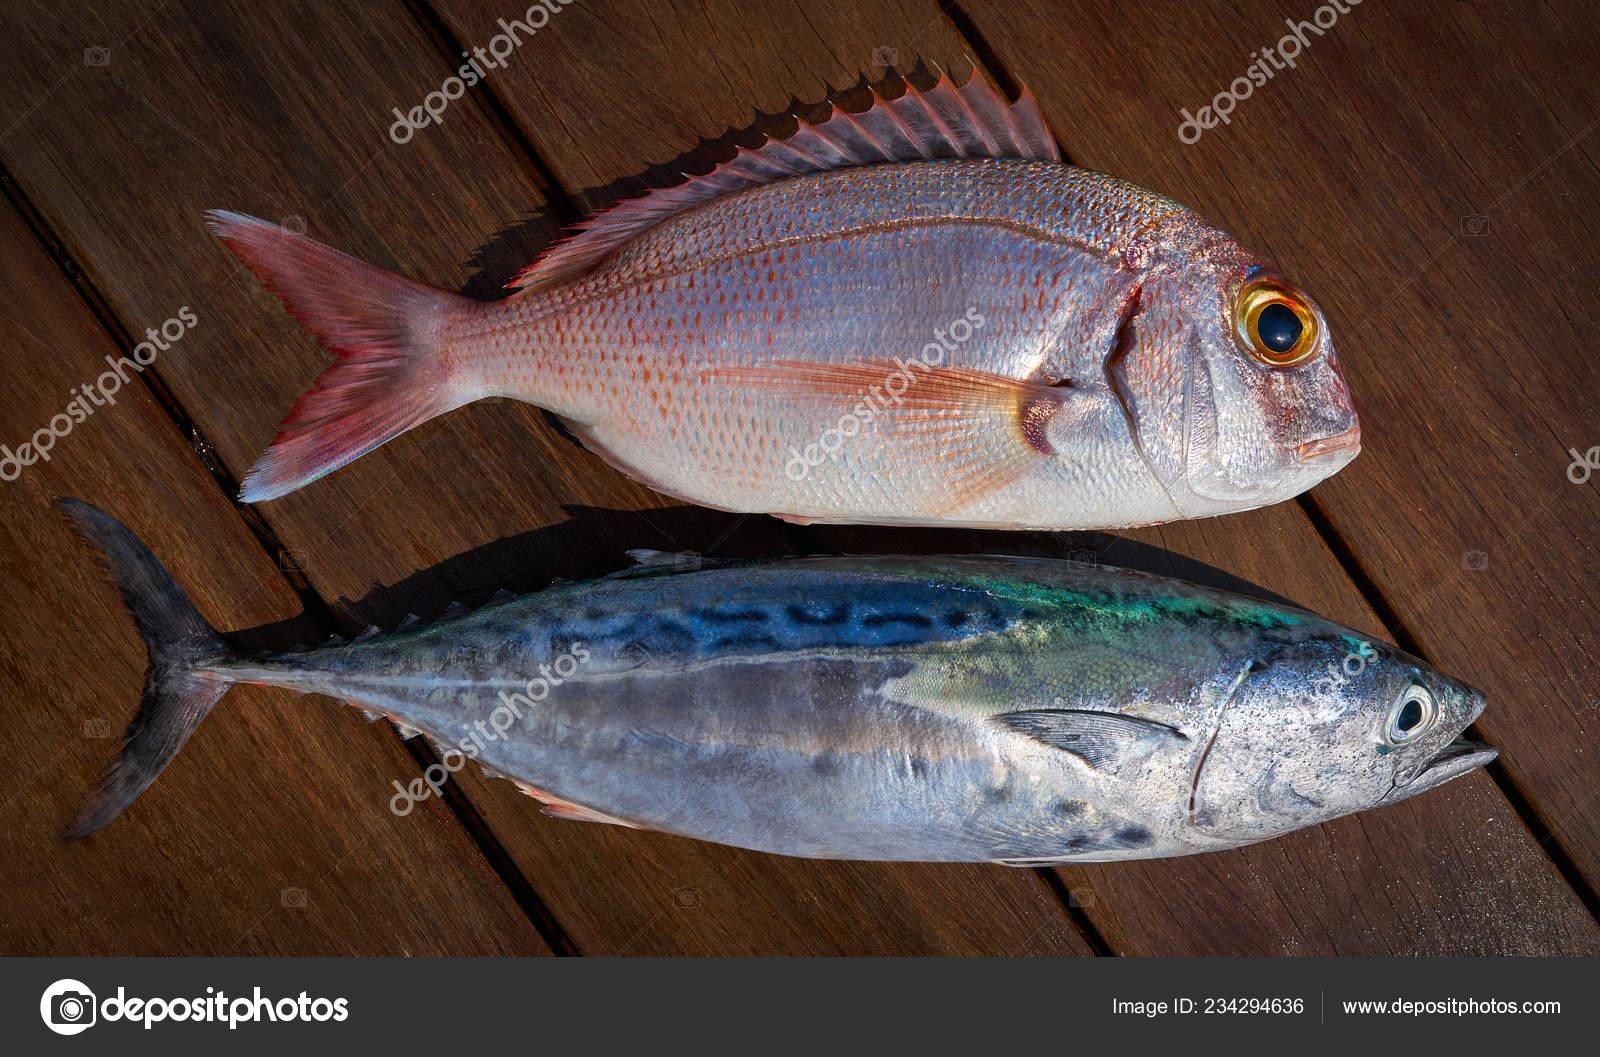 Snapper Fish Little Tunny Tuna Fish Catch Wooden Board